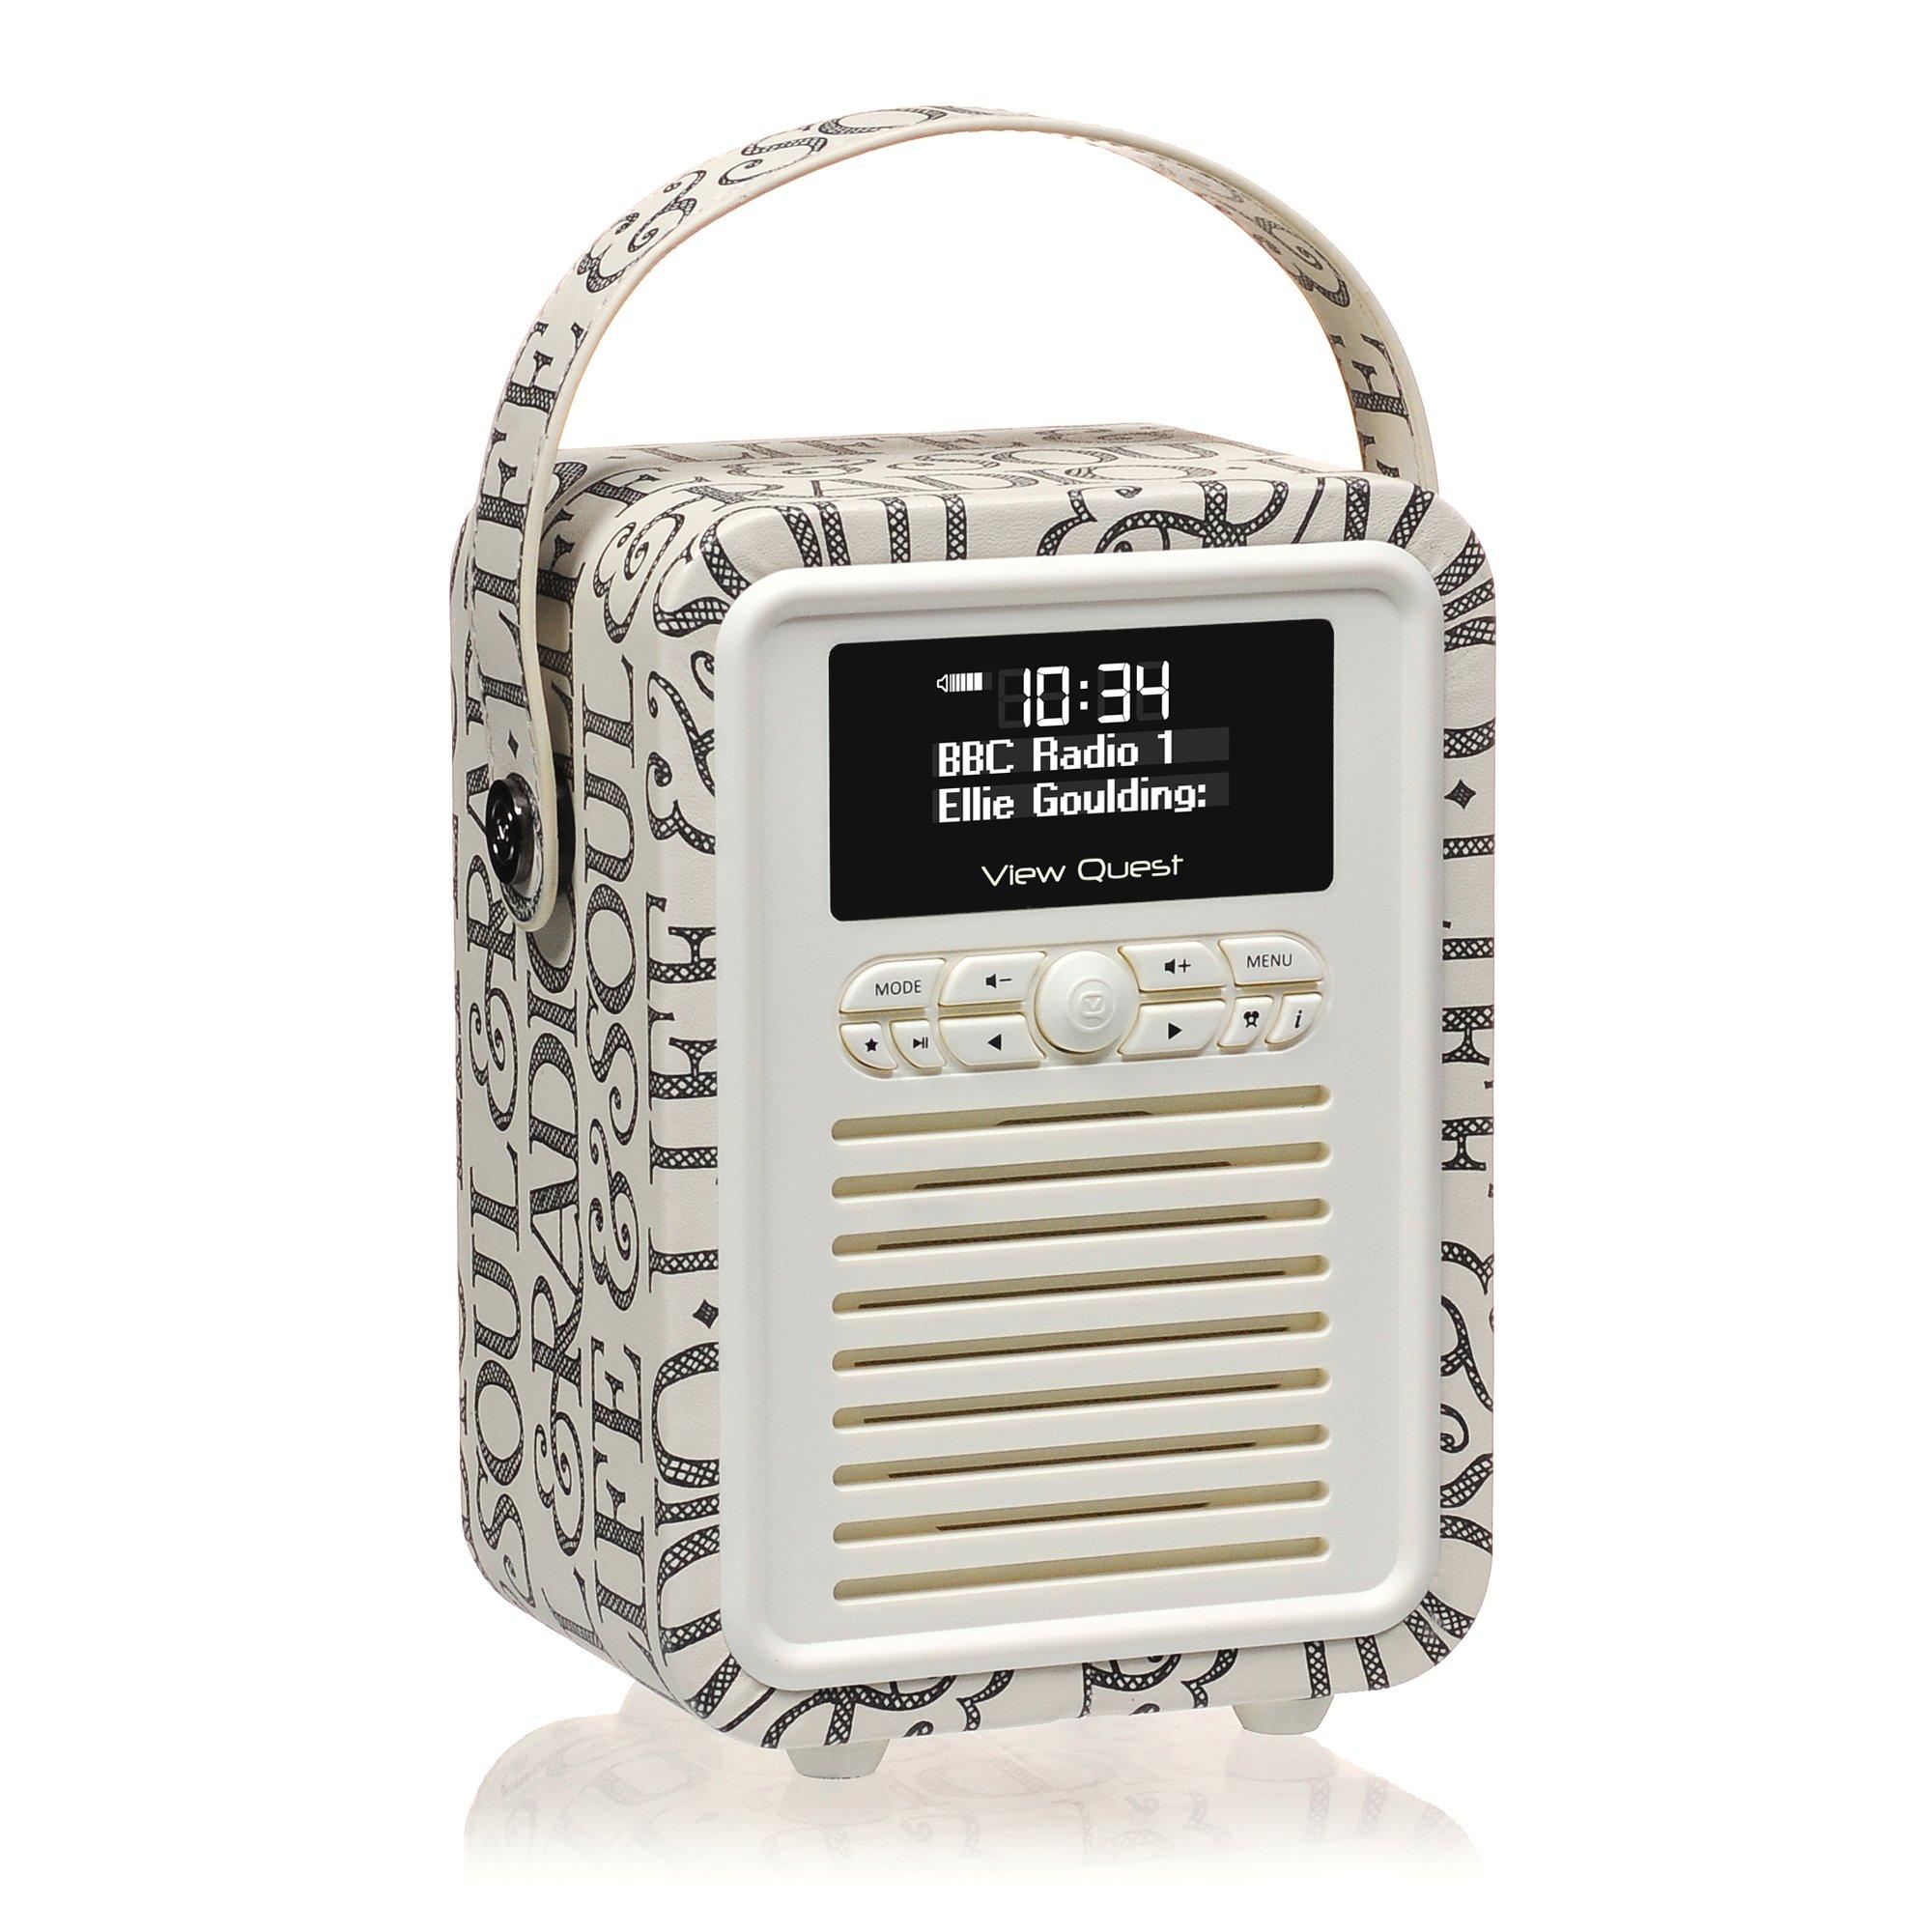 vq retro mini dab dab digital radio with fm bluetooth alarm clock emma ebay. Black Bedroom Furniture Sets. Home Design Ideas